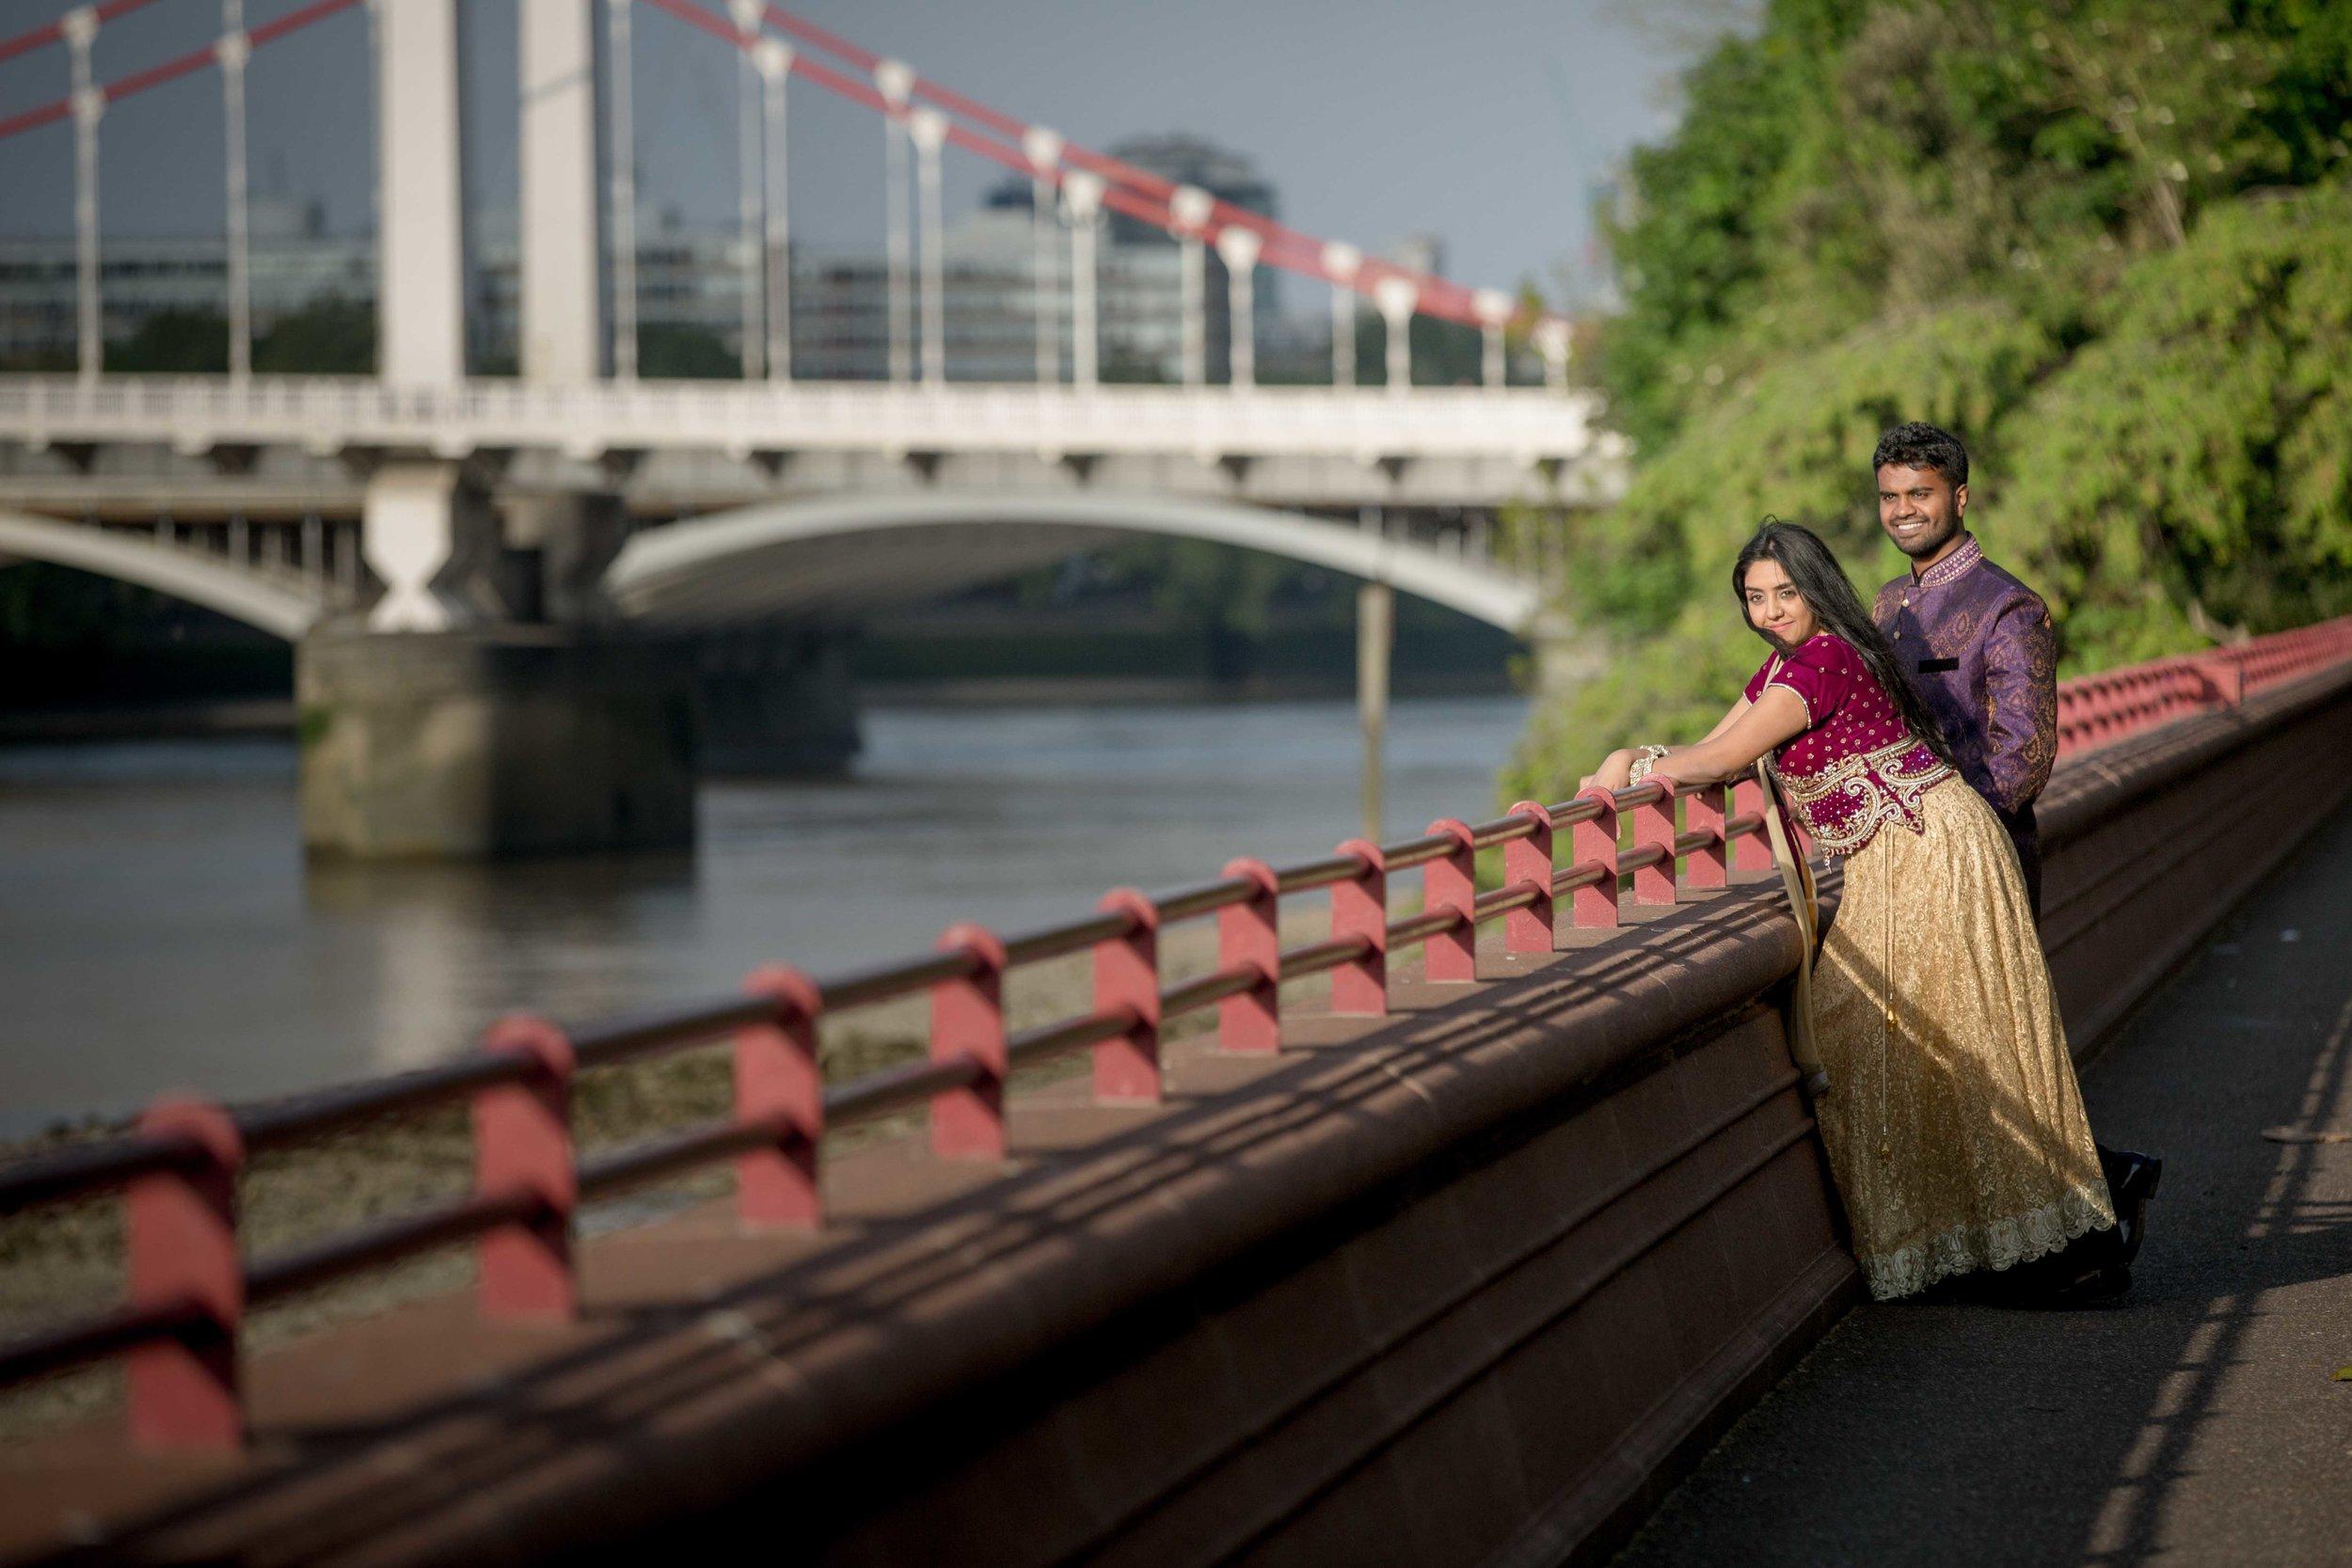 Battersea-park-pre-wedding-photoshoot-shoot-london-asian-wedding-photographer-natalia-smith-photography-11.jpg